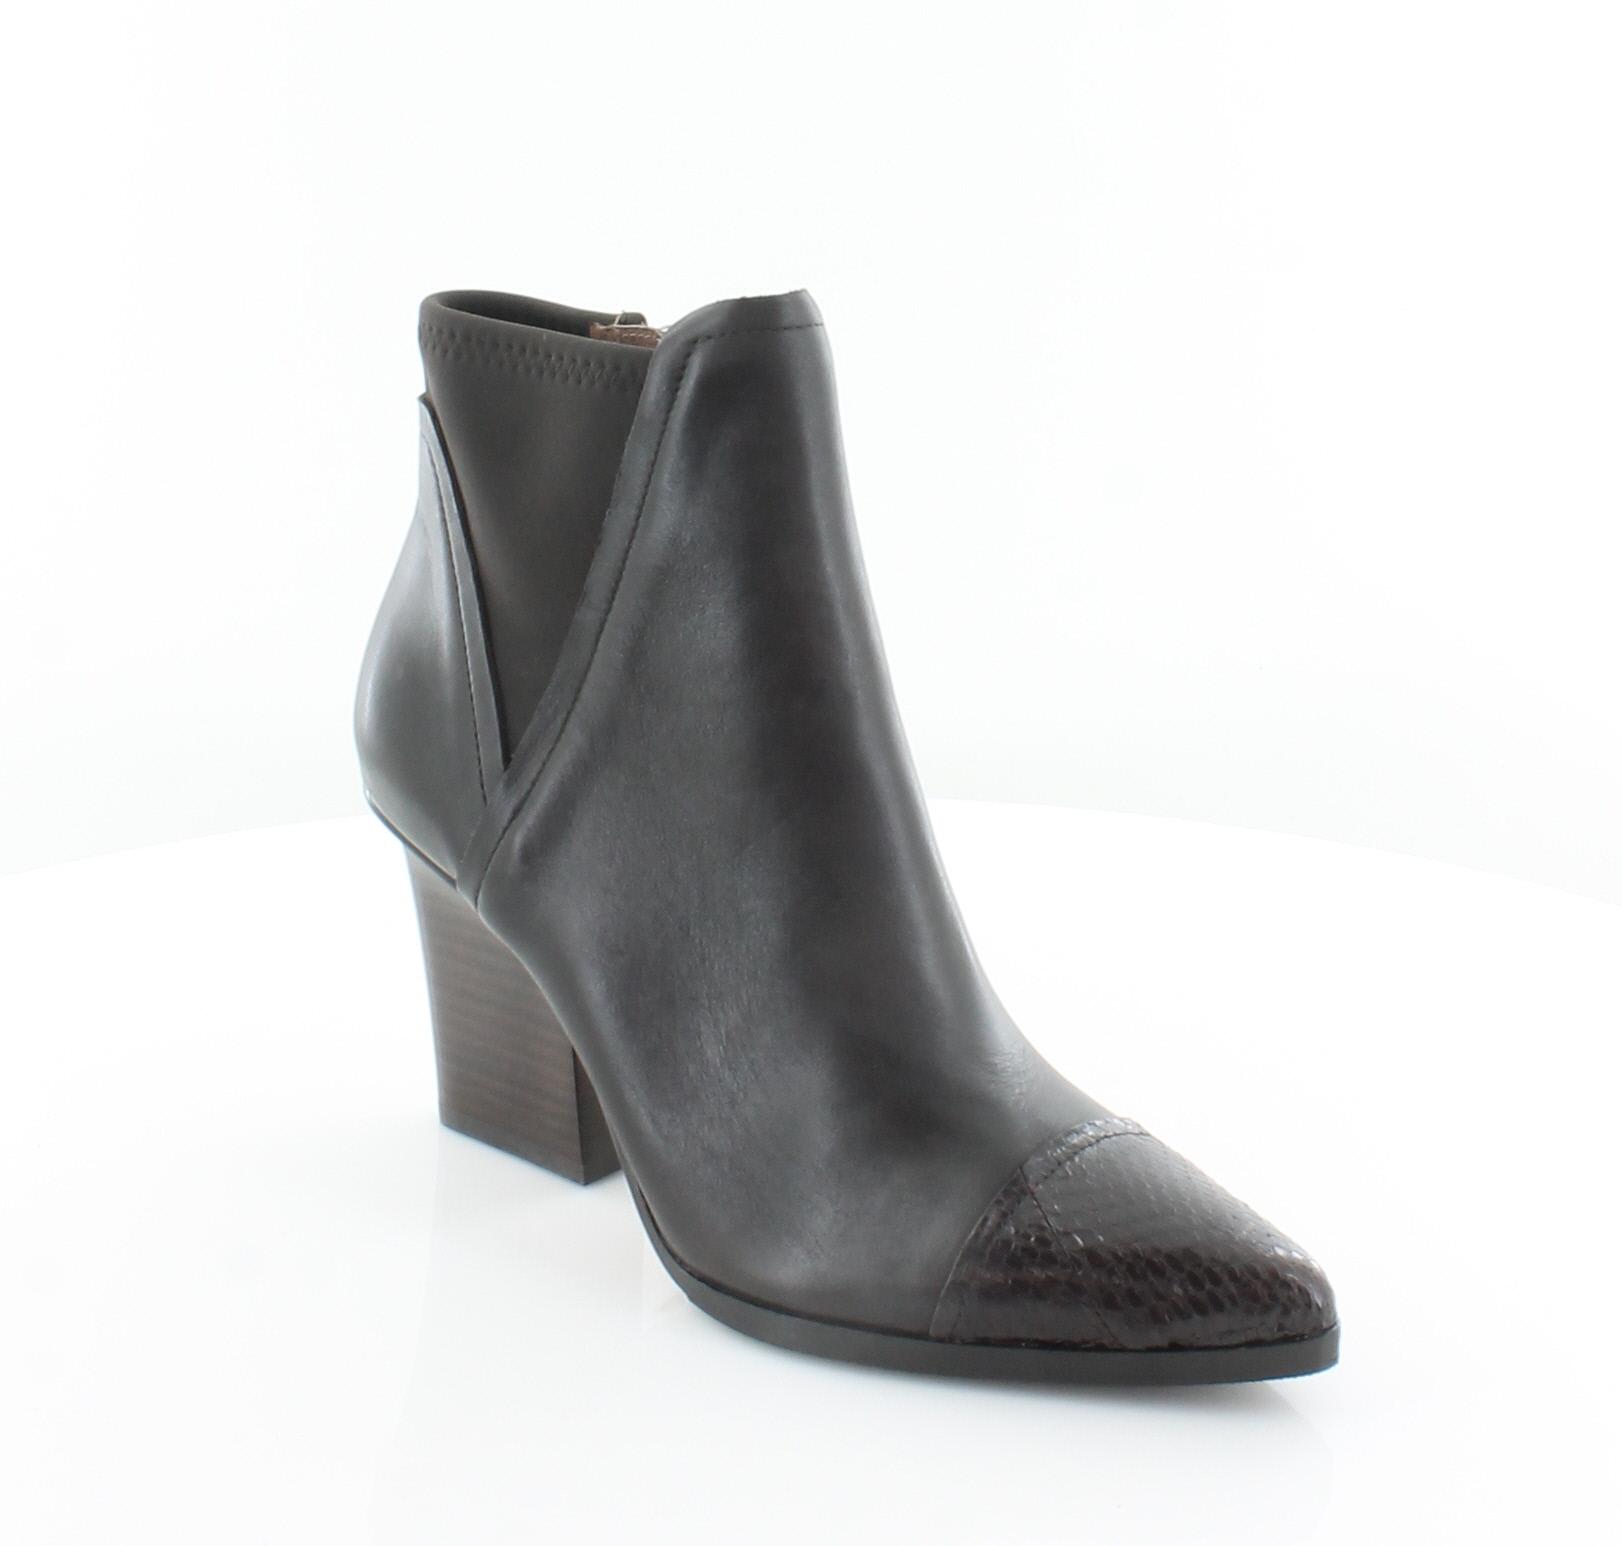 Donald J Pliner Vayghn Brown Womens Shoes Size 6.5 M Boots MSRP $298